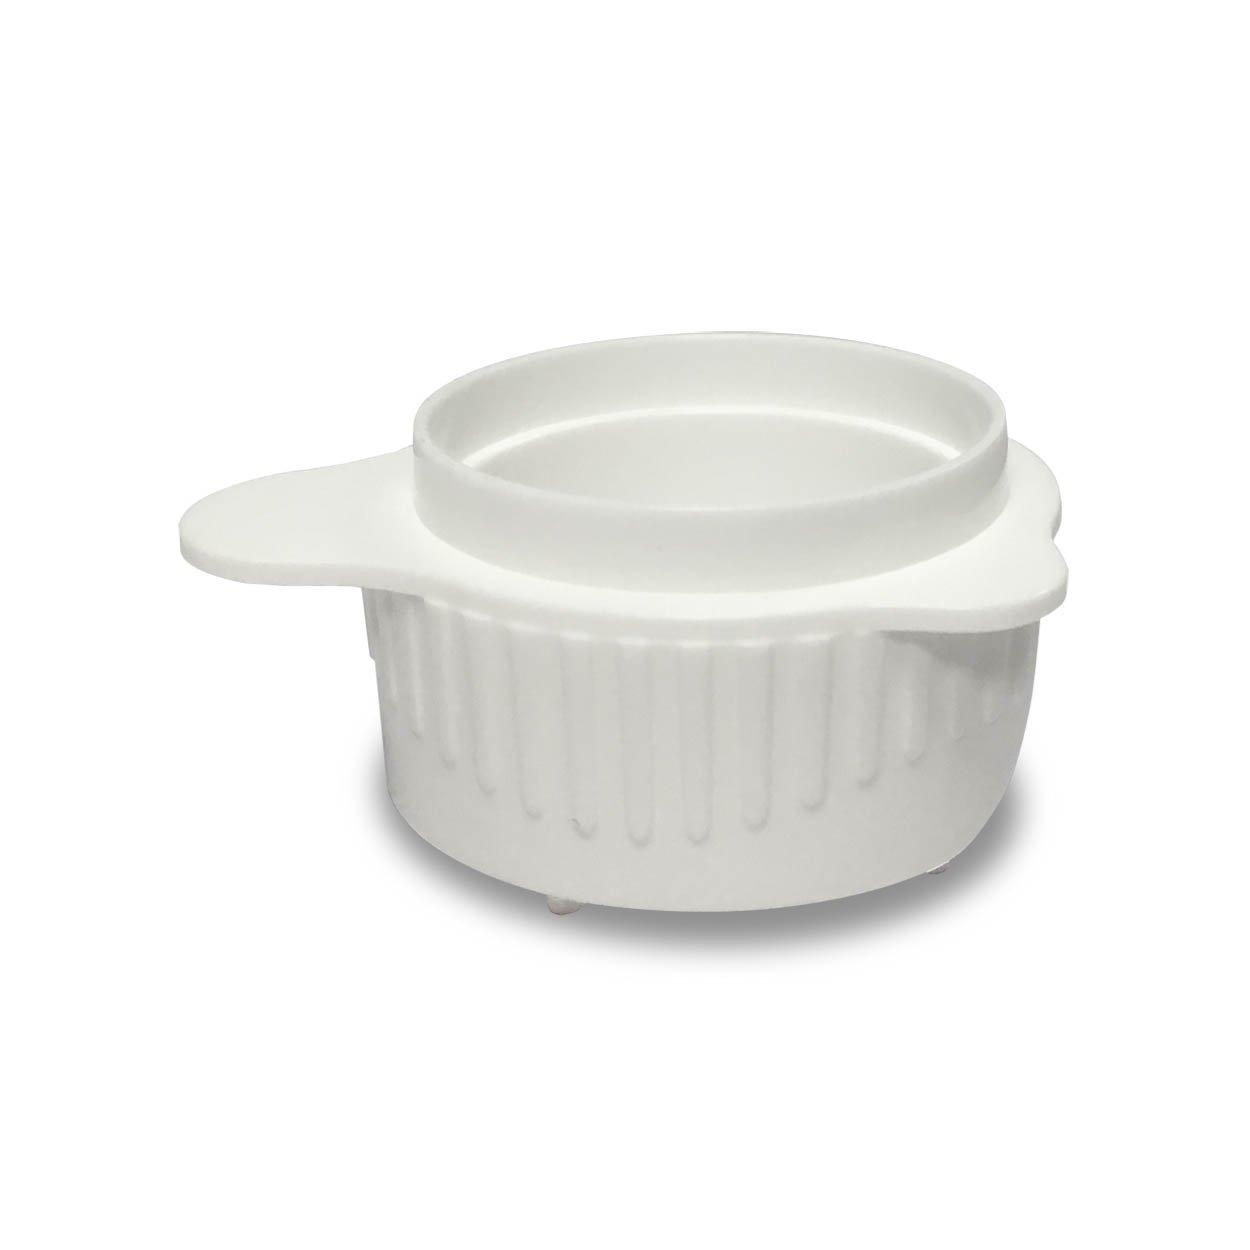 SureStrain 70um Premium Cell Strainer - White (600 Strainers & 12 Reducing Adapters/Case)